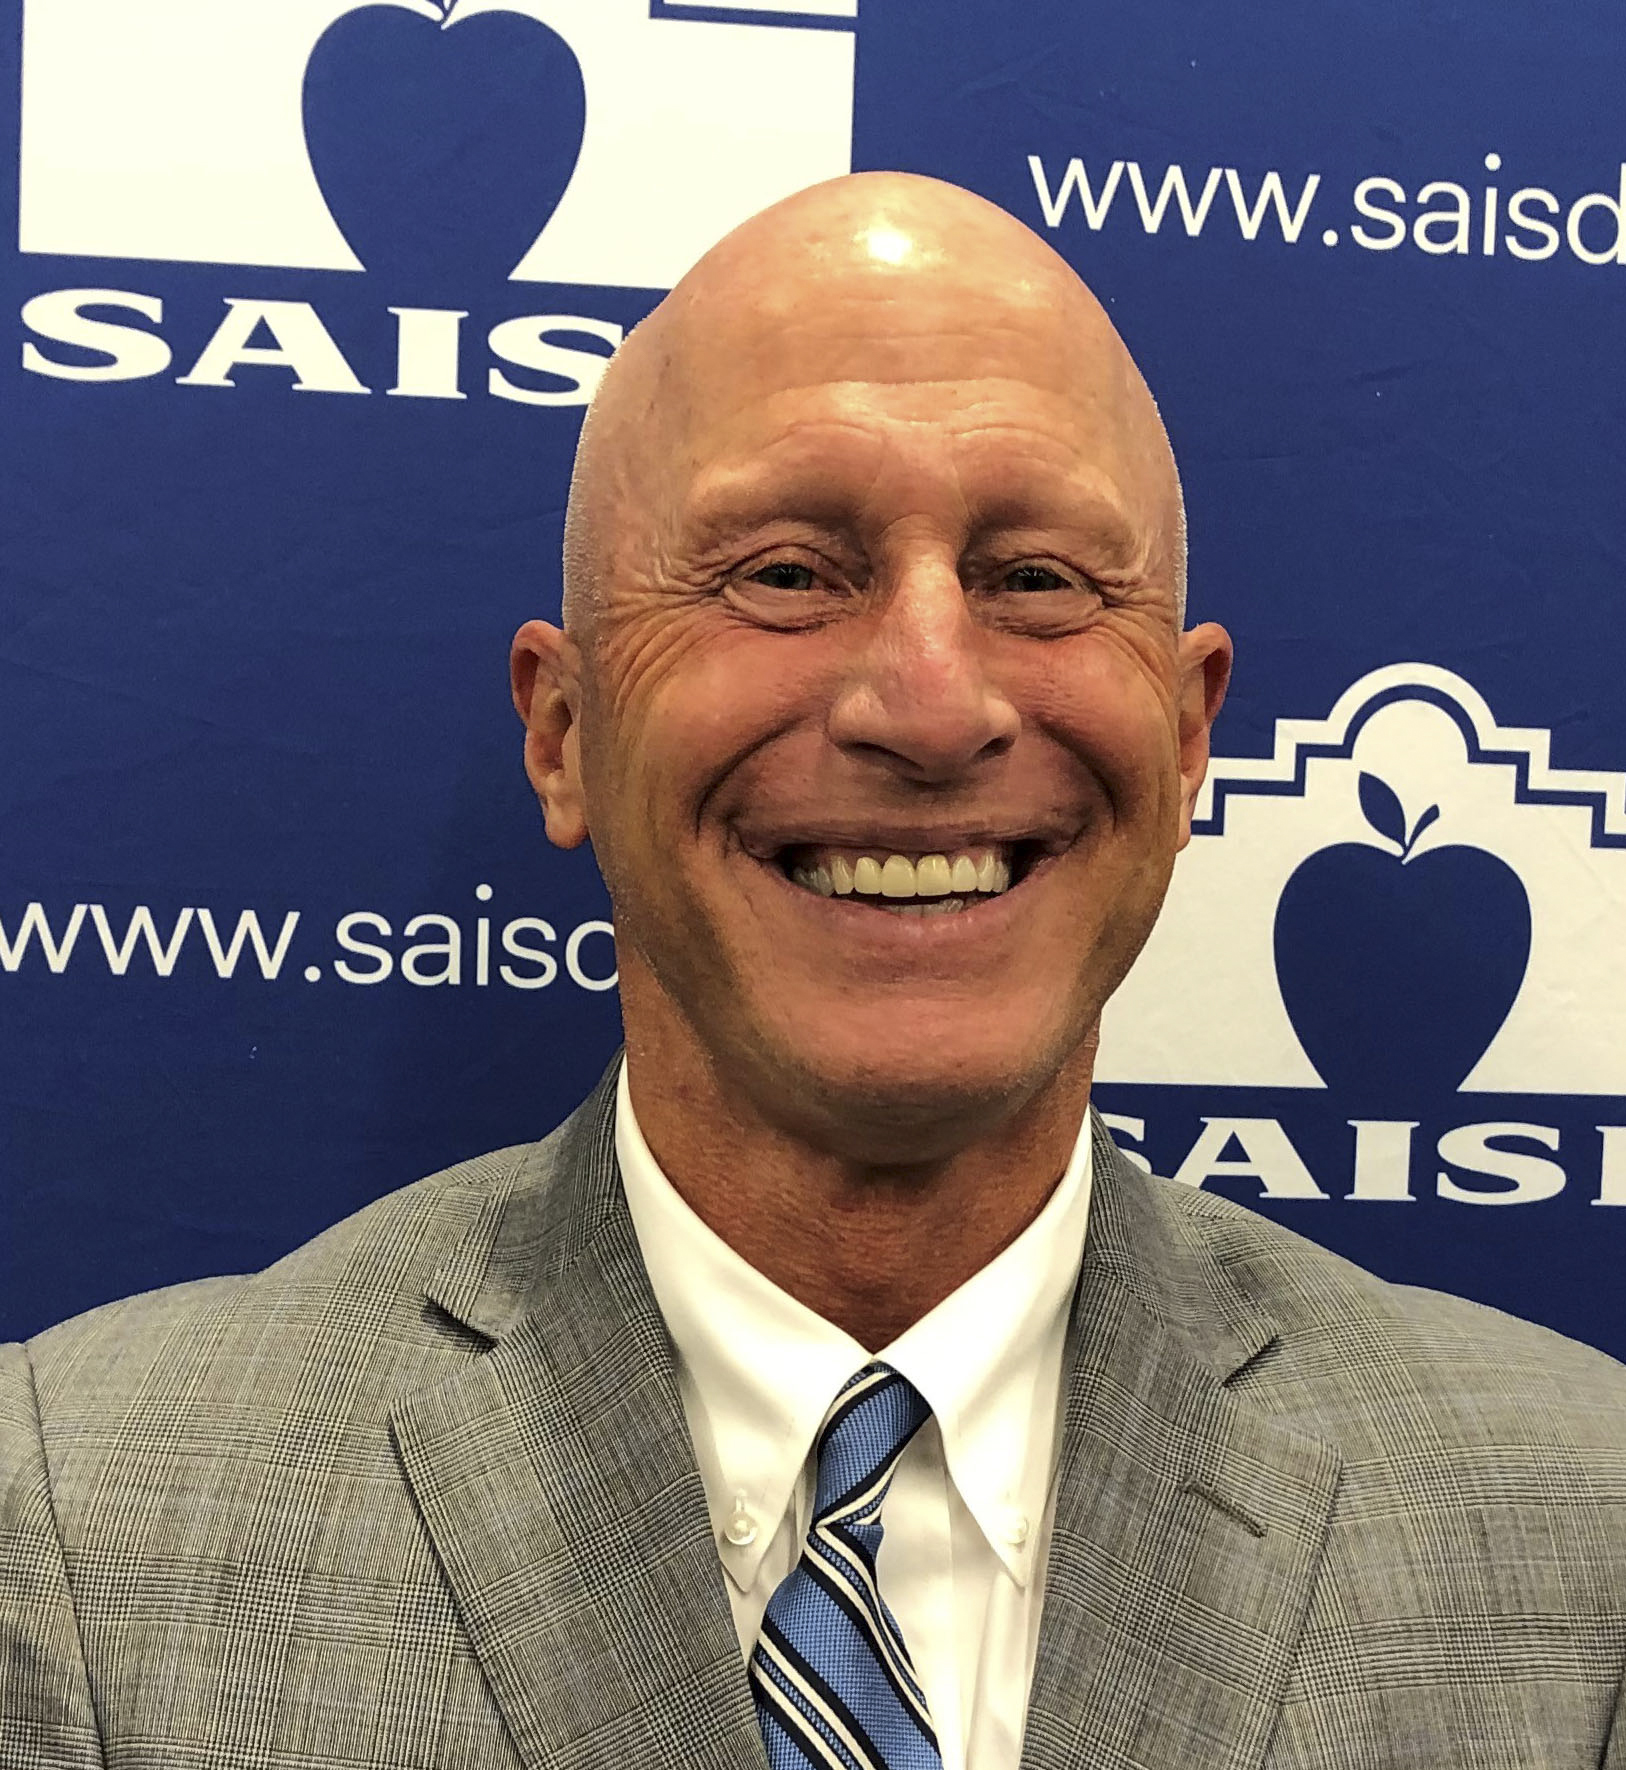 Robert Jaklich, a former superintendent for Harlandale ISD, has been named interim superintendent for SAISD.